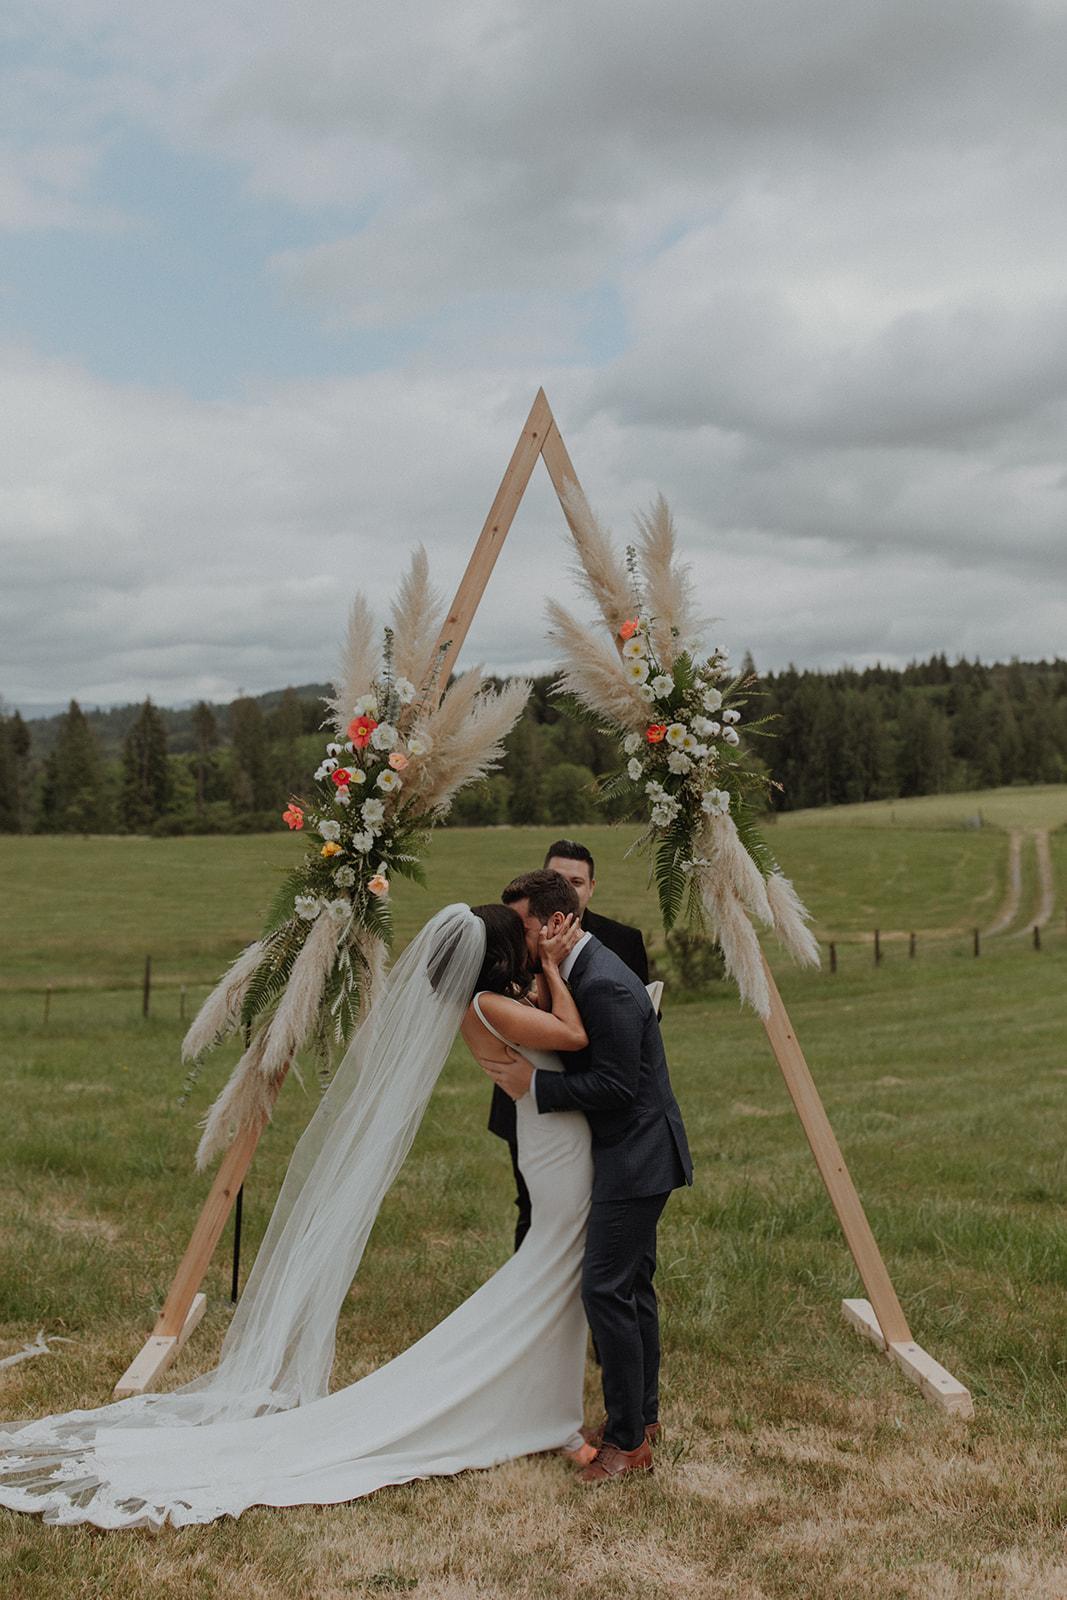 cortney_skye_wedding_june2019-421.jpg